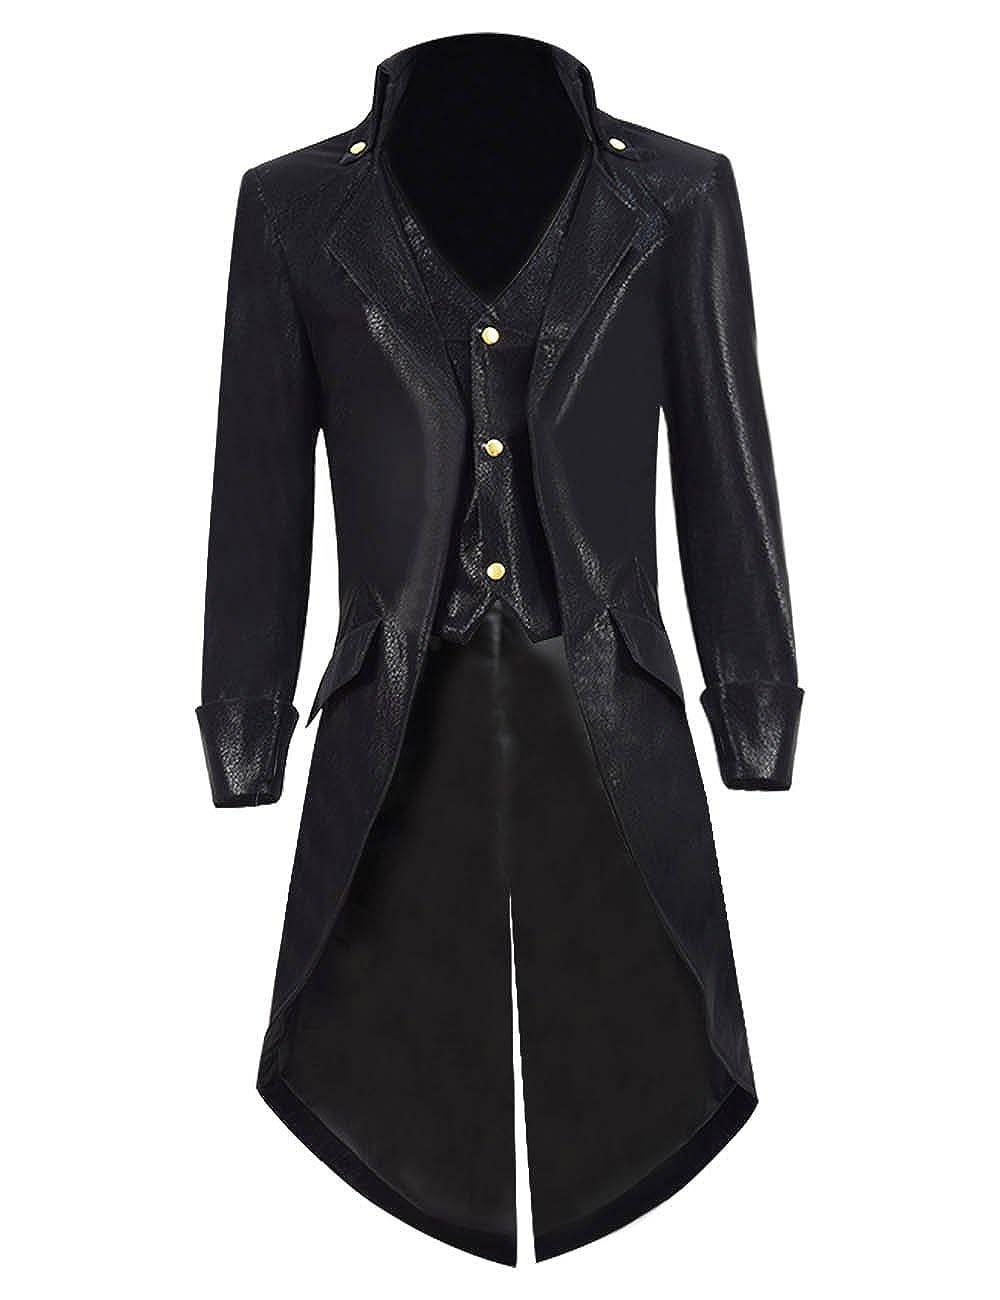 e71cbe299811 Amazon.com  BelieveME Kid s Steampunk Jacket Tailcoat Gothic Costume  Halloween PU Long Coat  Clothing